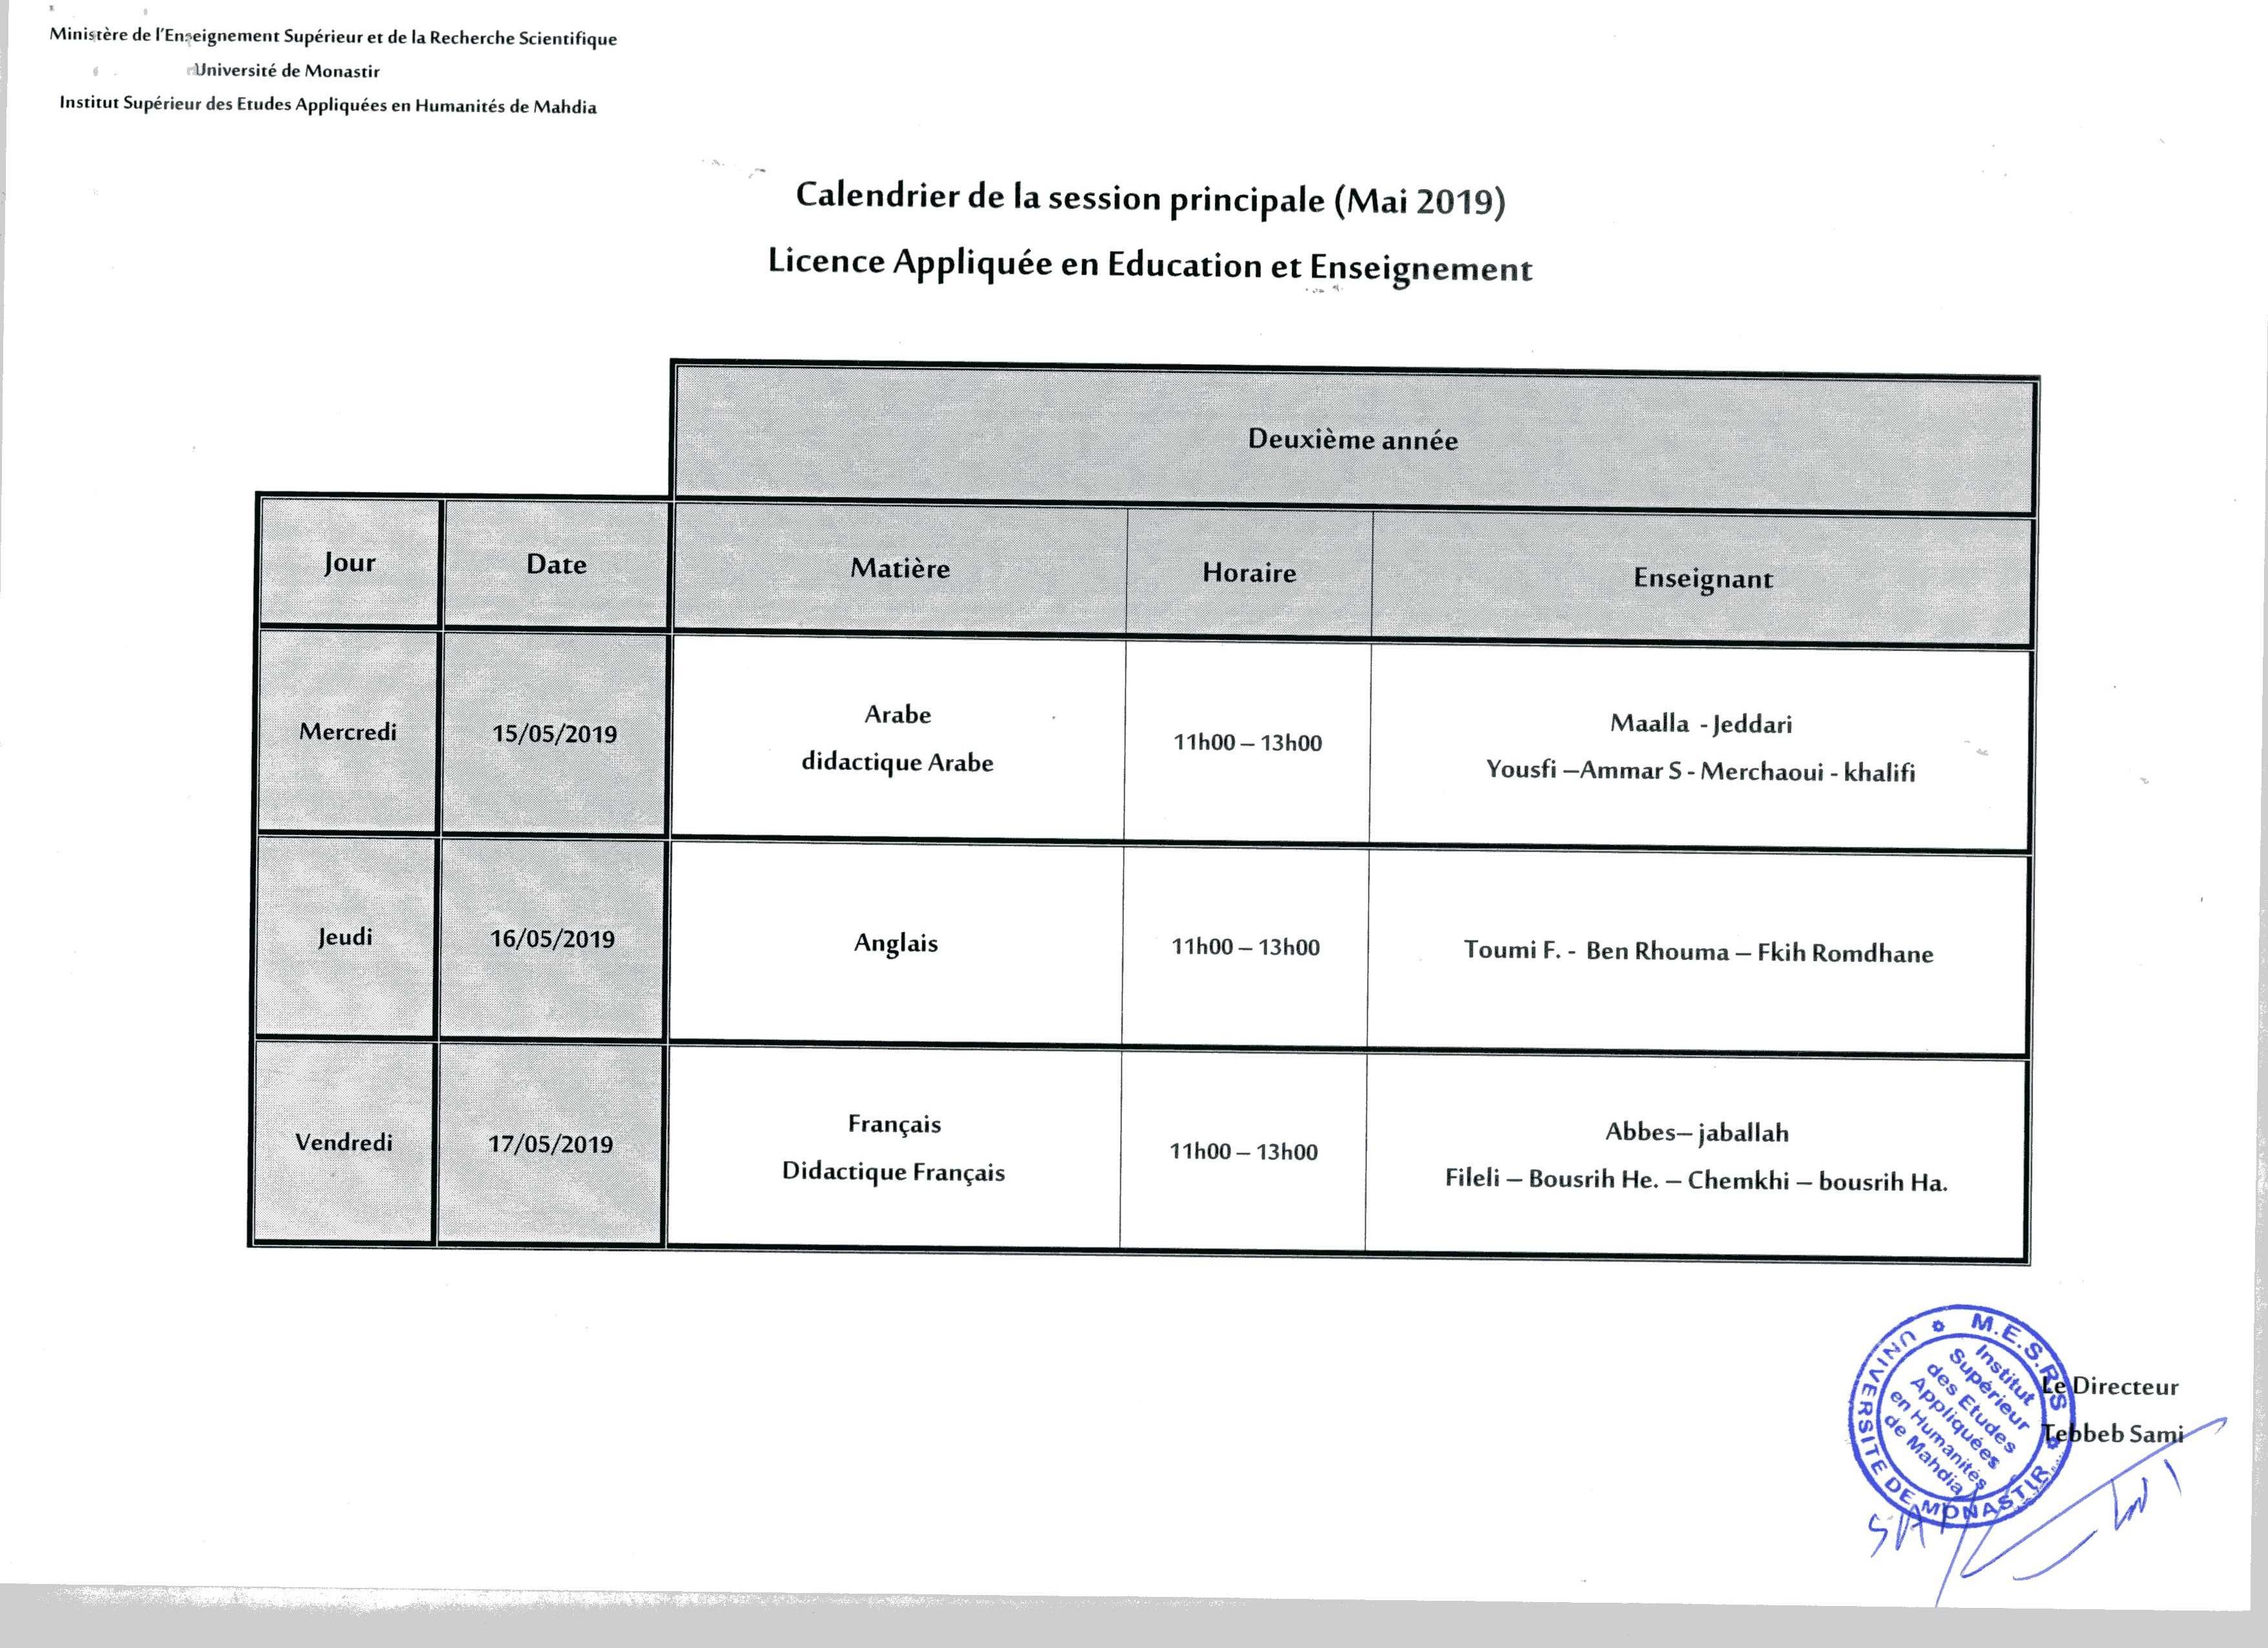 Calendrier Mai2019.Iseahm Calendrier De La Session Principale Mai 2019